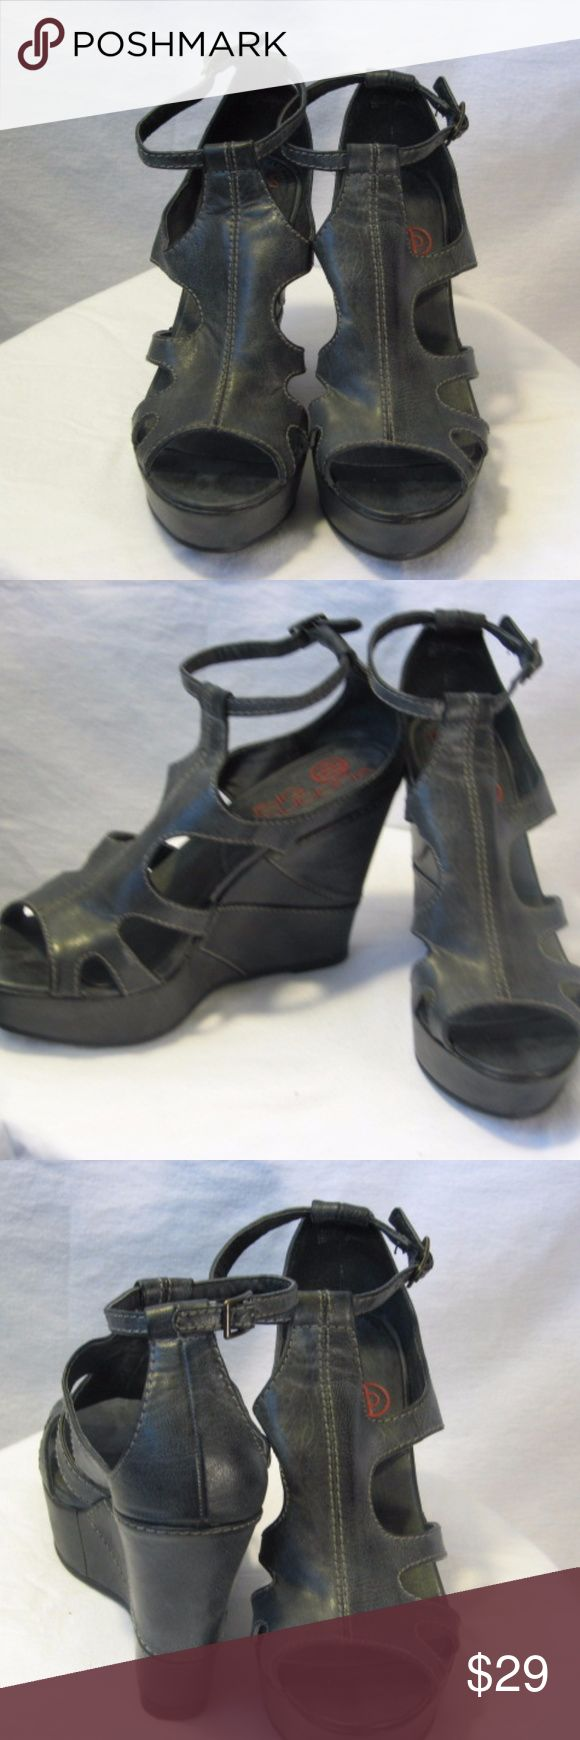 Big Buddha, Black Wedge Designer Sandals Black Wedge Scandals 5-inch heels Soft Leather New without box Big Buddha Shoes Mules & Clogs